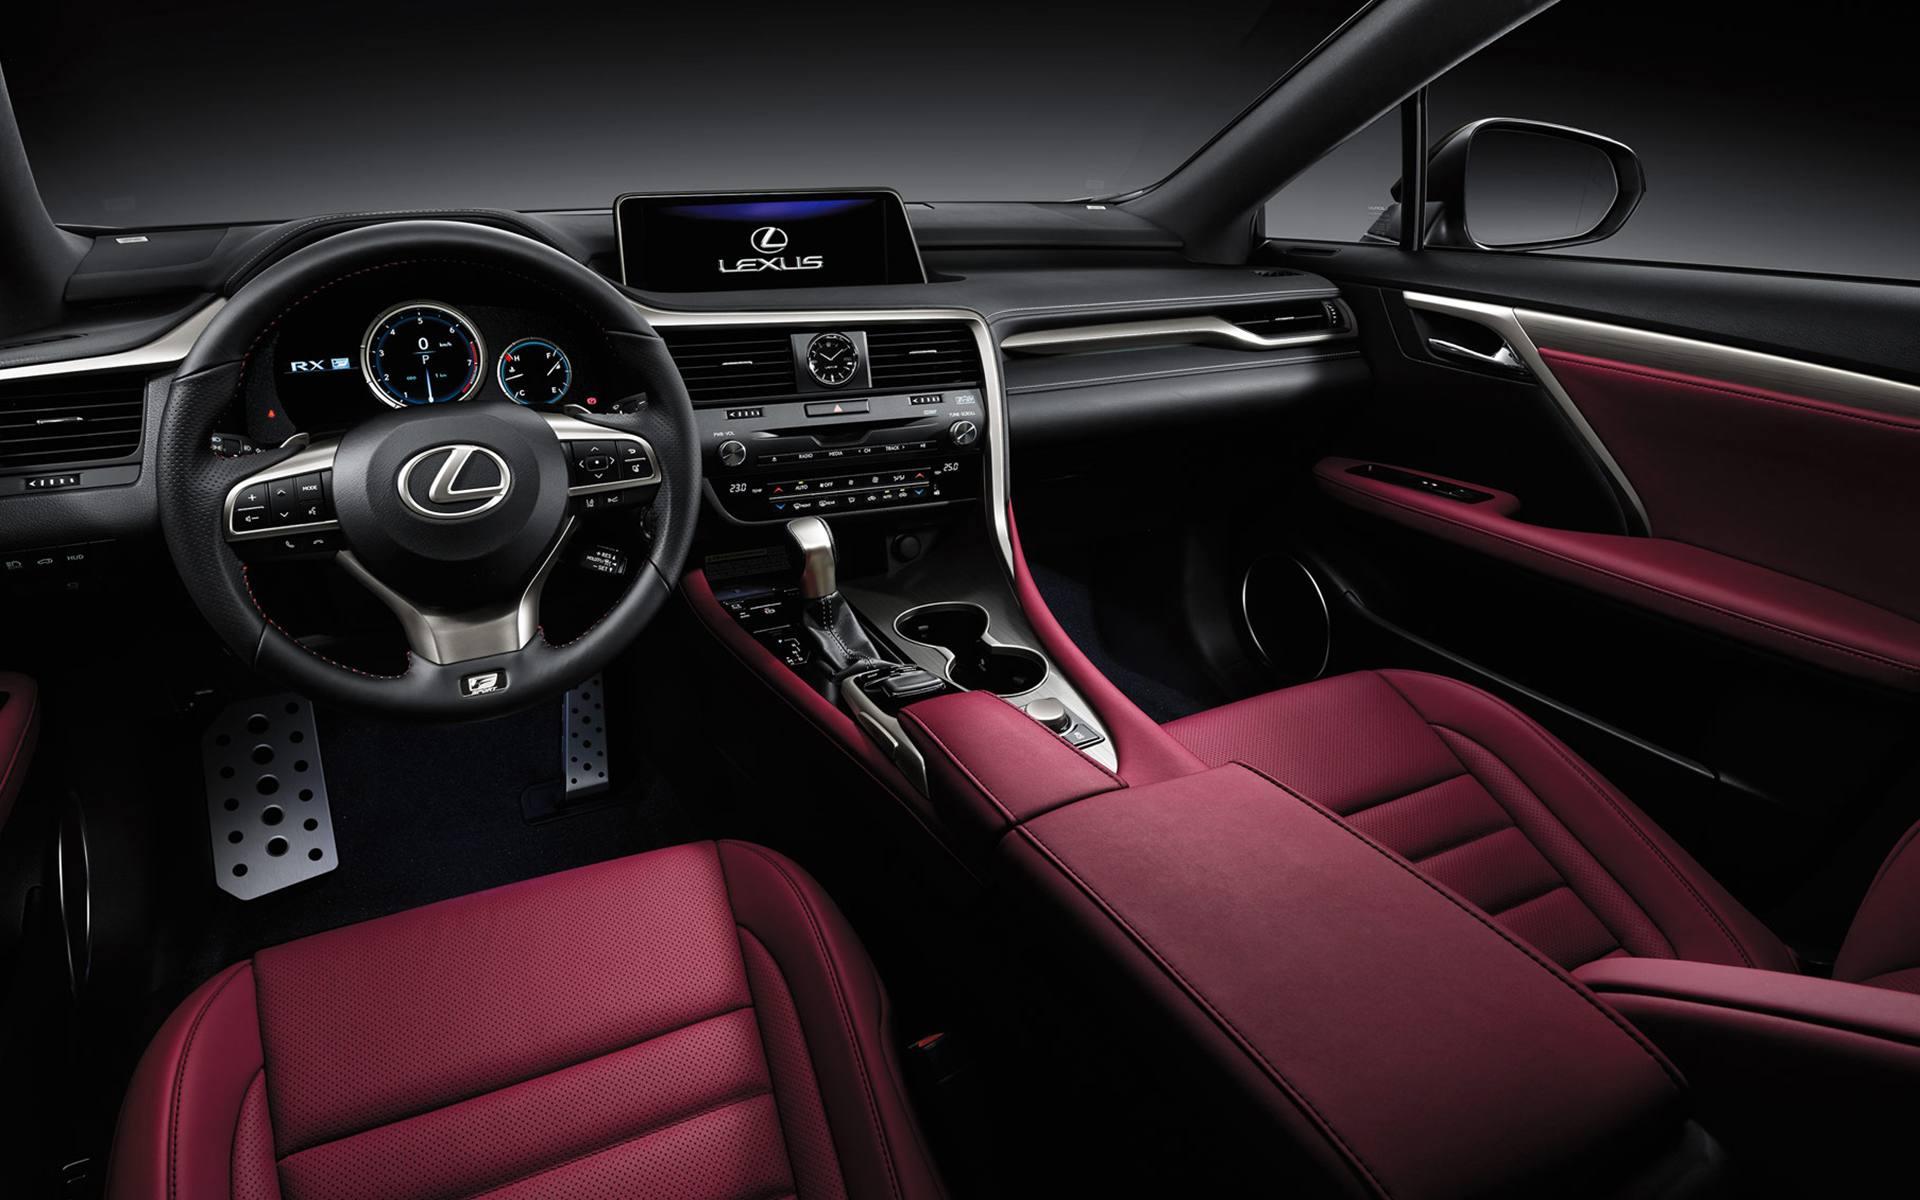 lexus-2019-rx-350-f-sport-interior-front-seats-dashboard-x